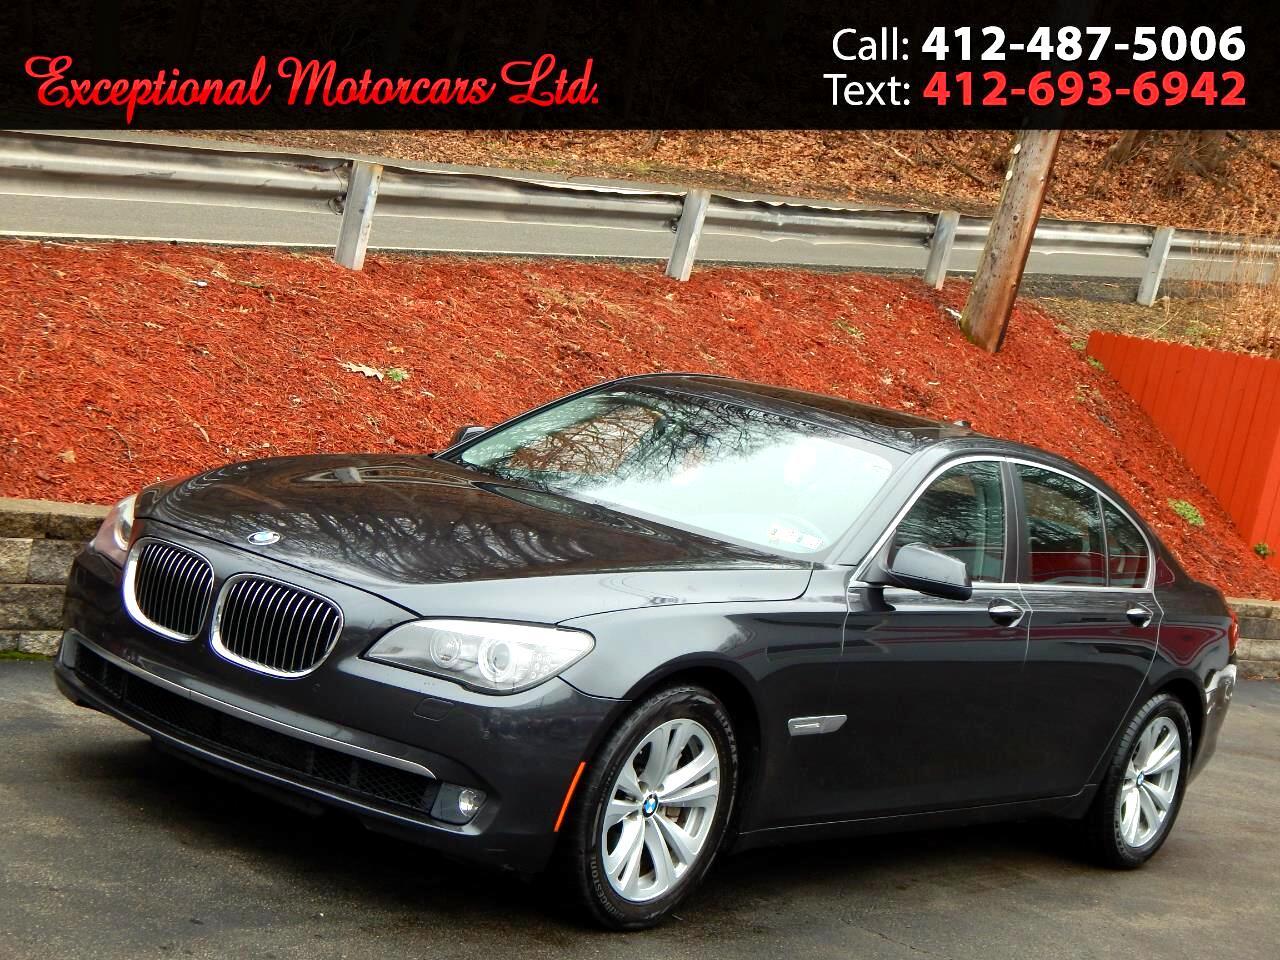 2011 BMW 7 Series 4dr Sdn 740i RWD